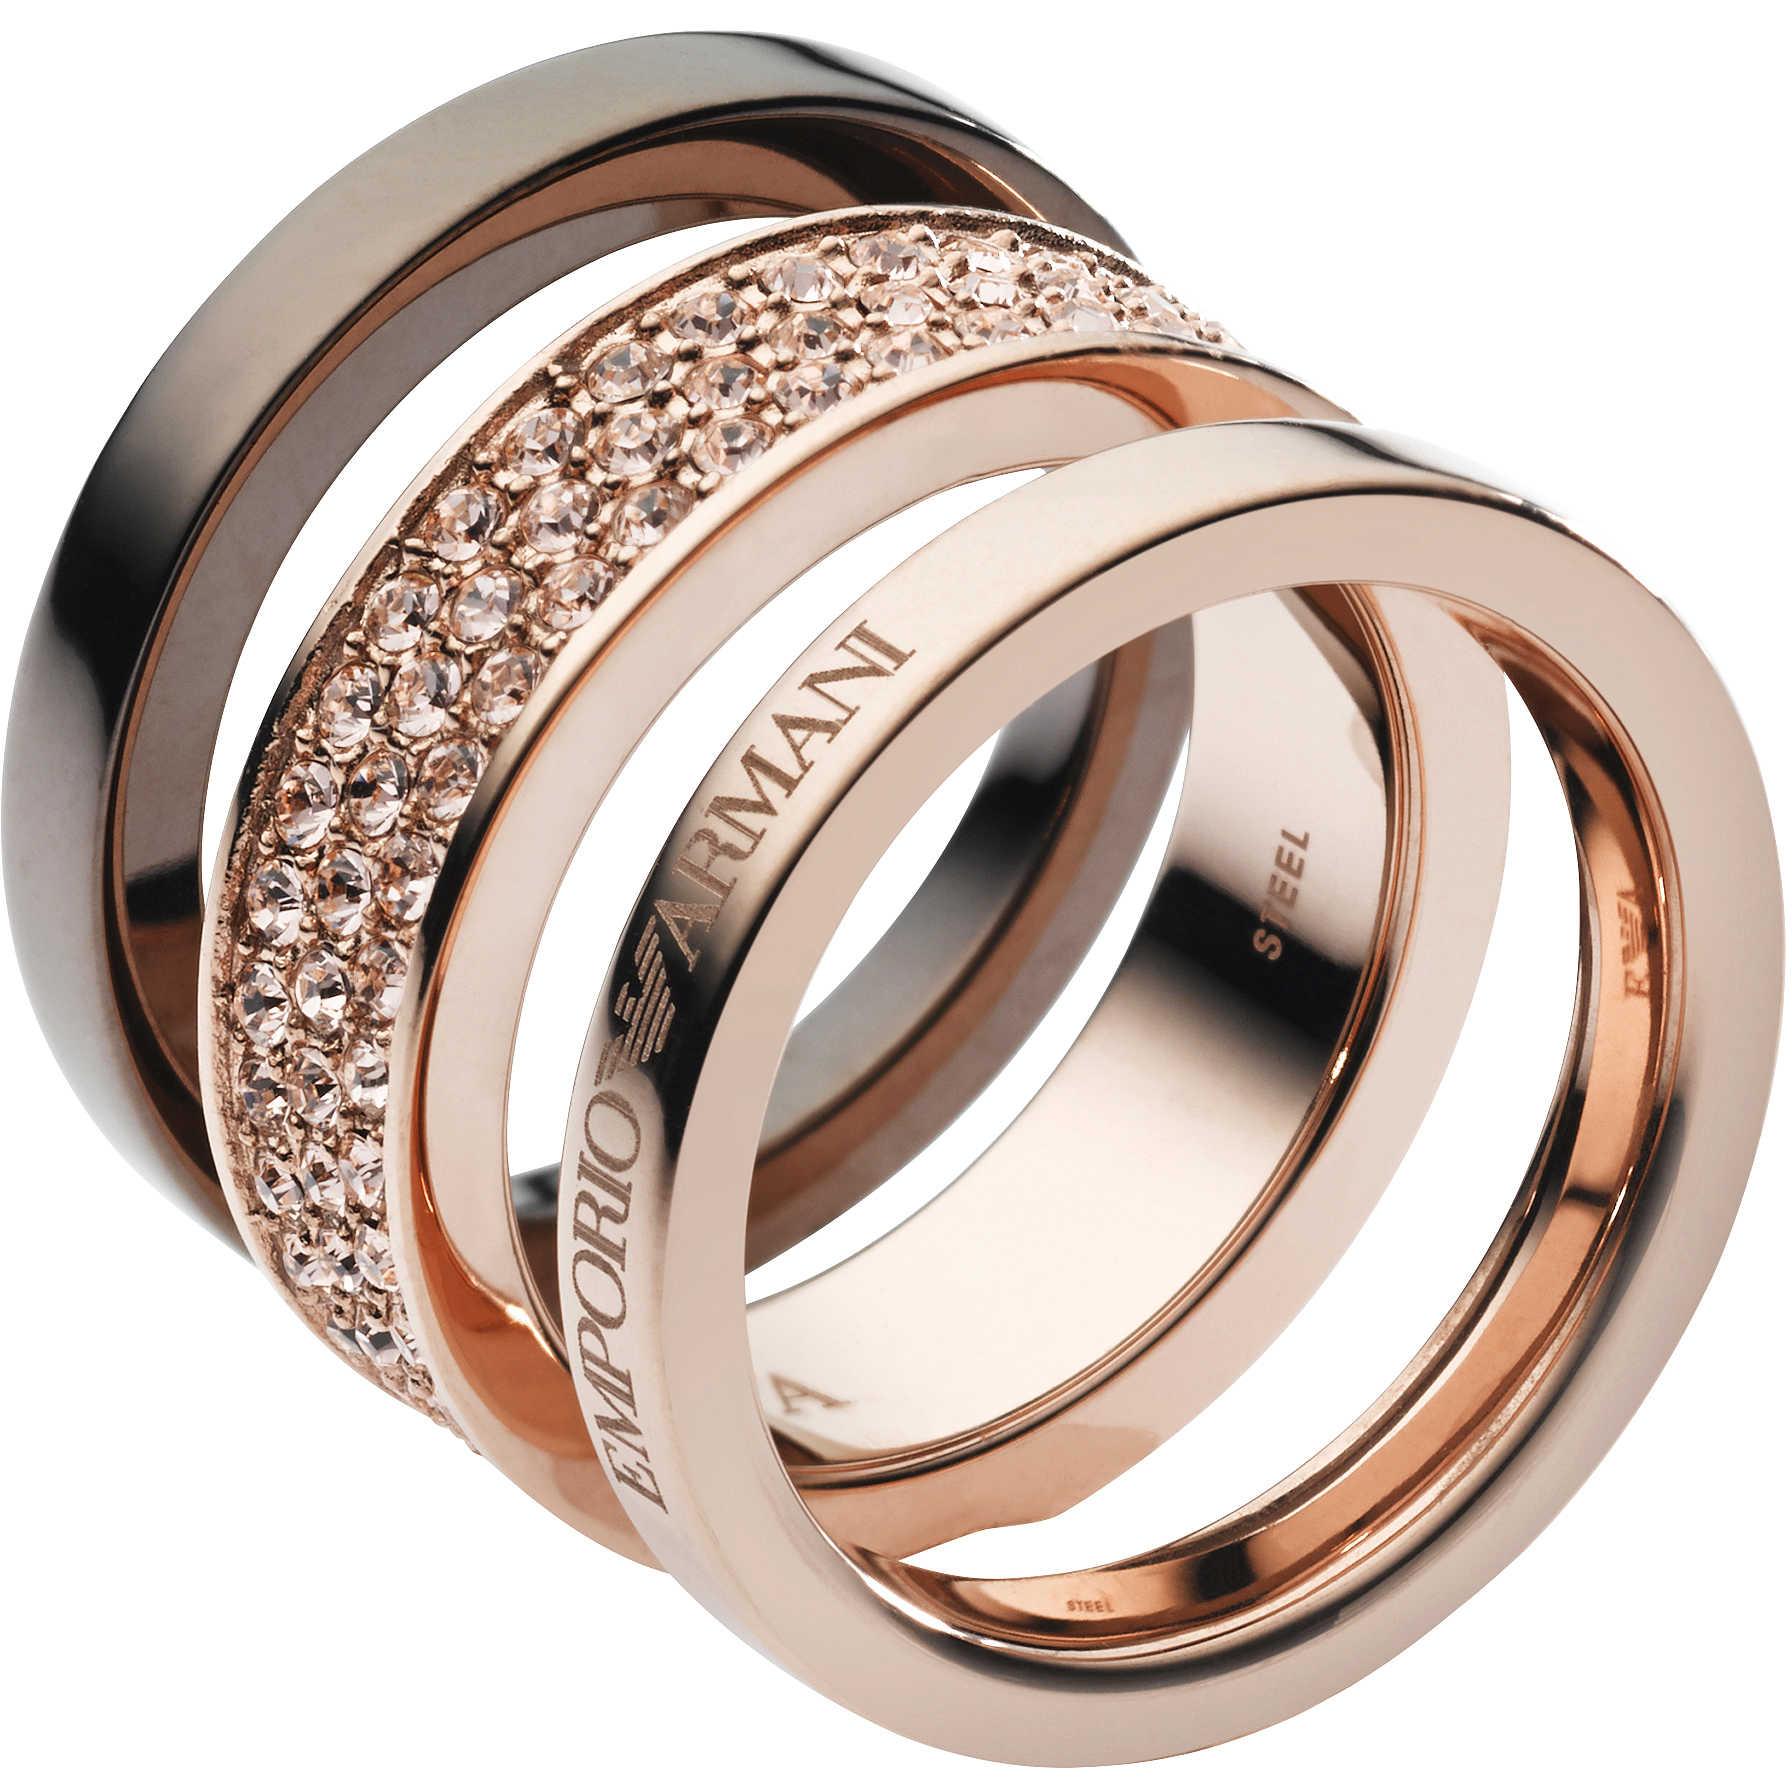 ring woman jewellery Emporio Armani EGS1778221508 rings Emporio Armani